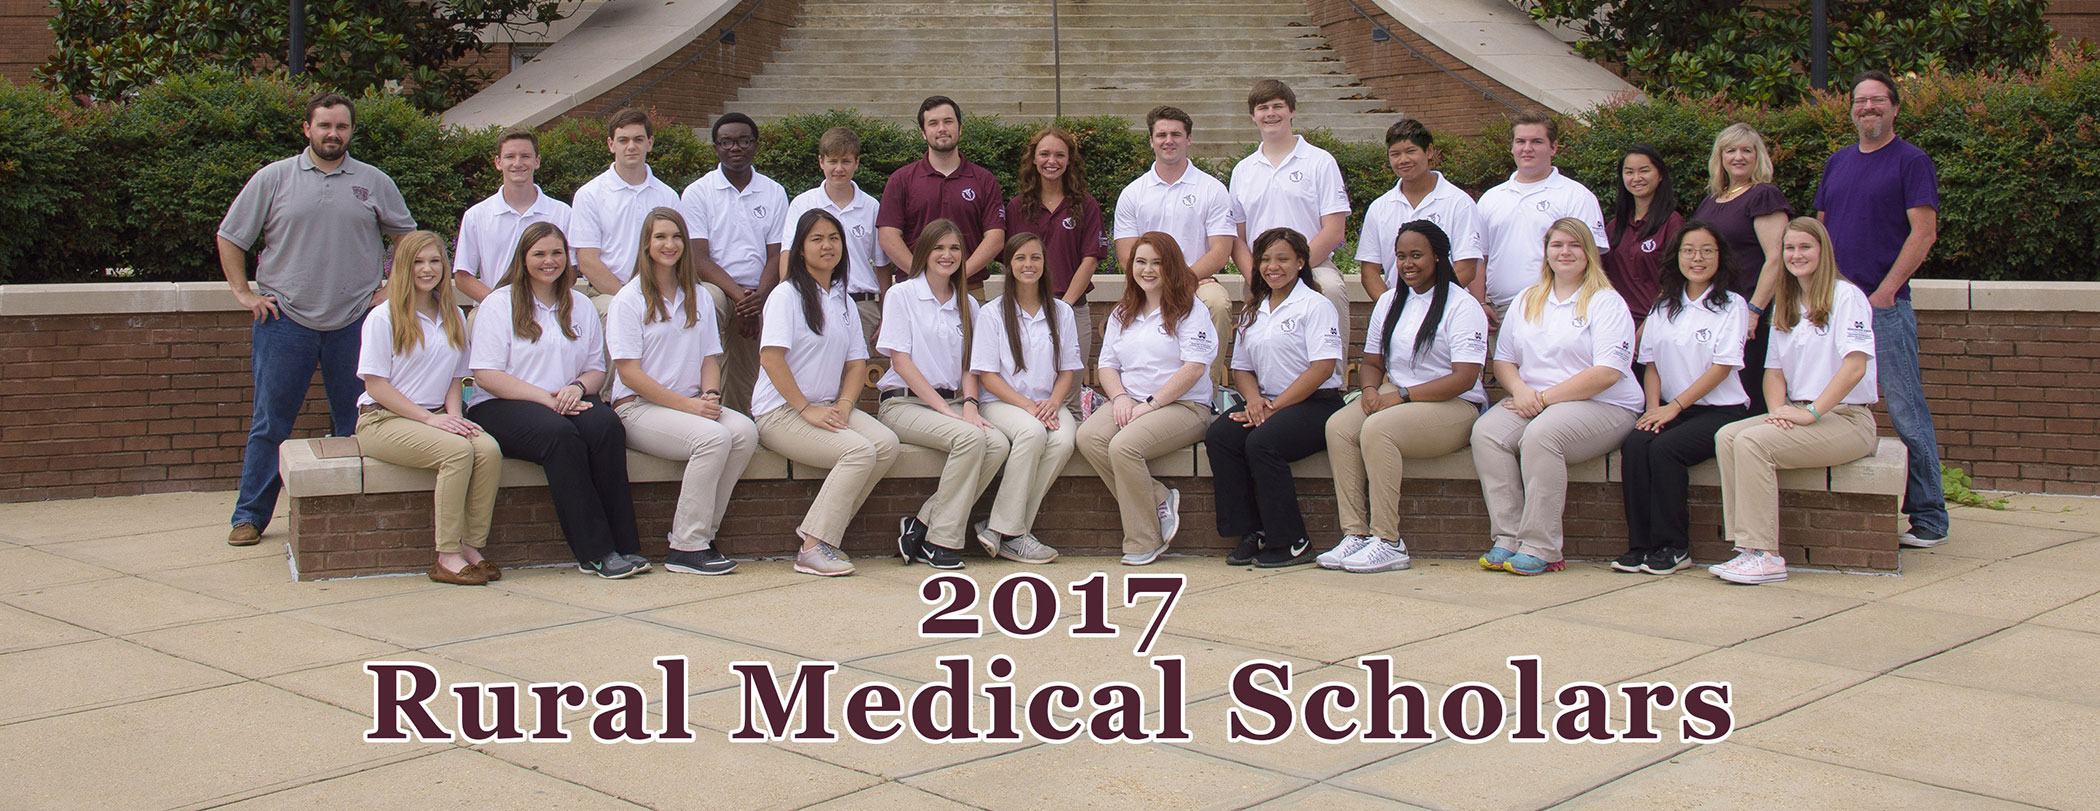 2017 RMS scholars